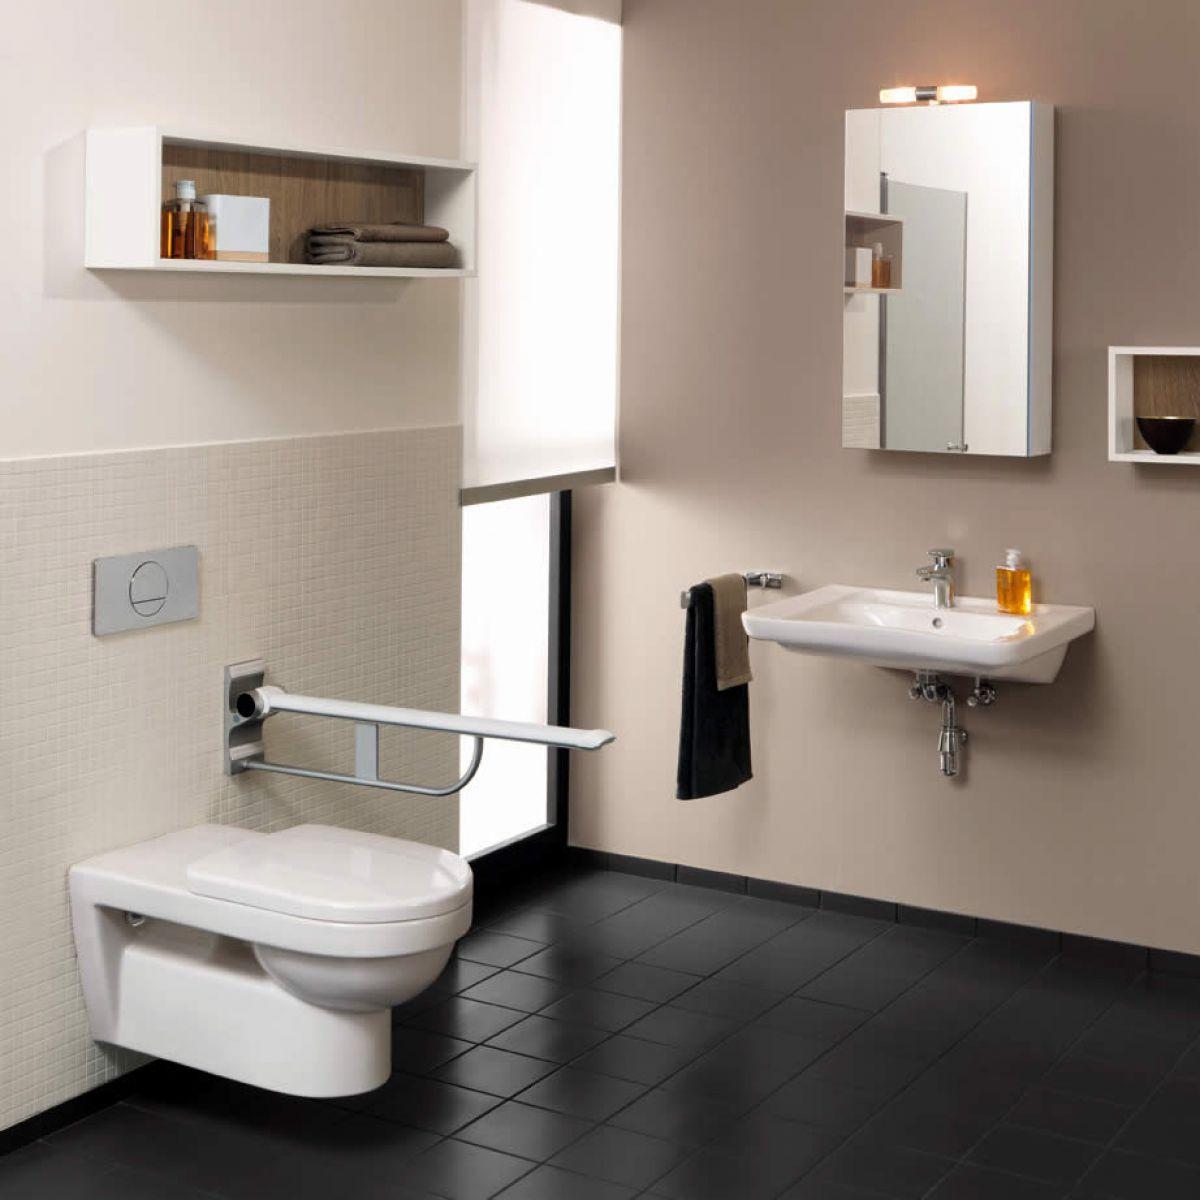 v b architectura washdown wc vita uk bathrooms. Black Bedroom Furniture Sets. Home Design Ideas